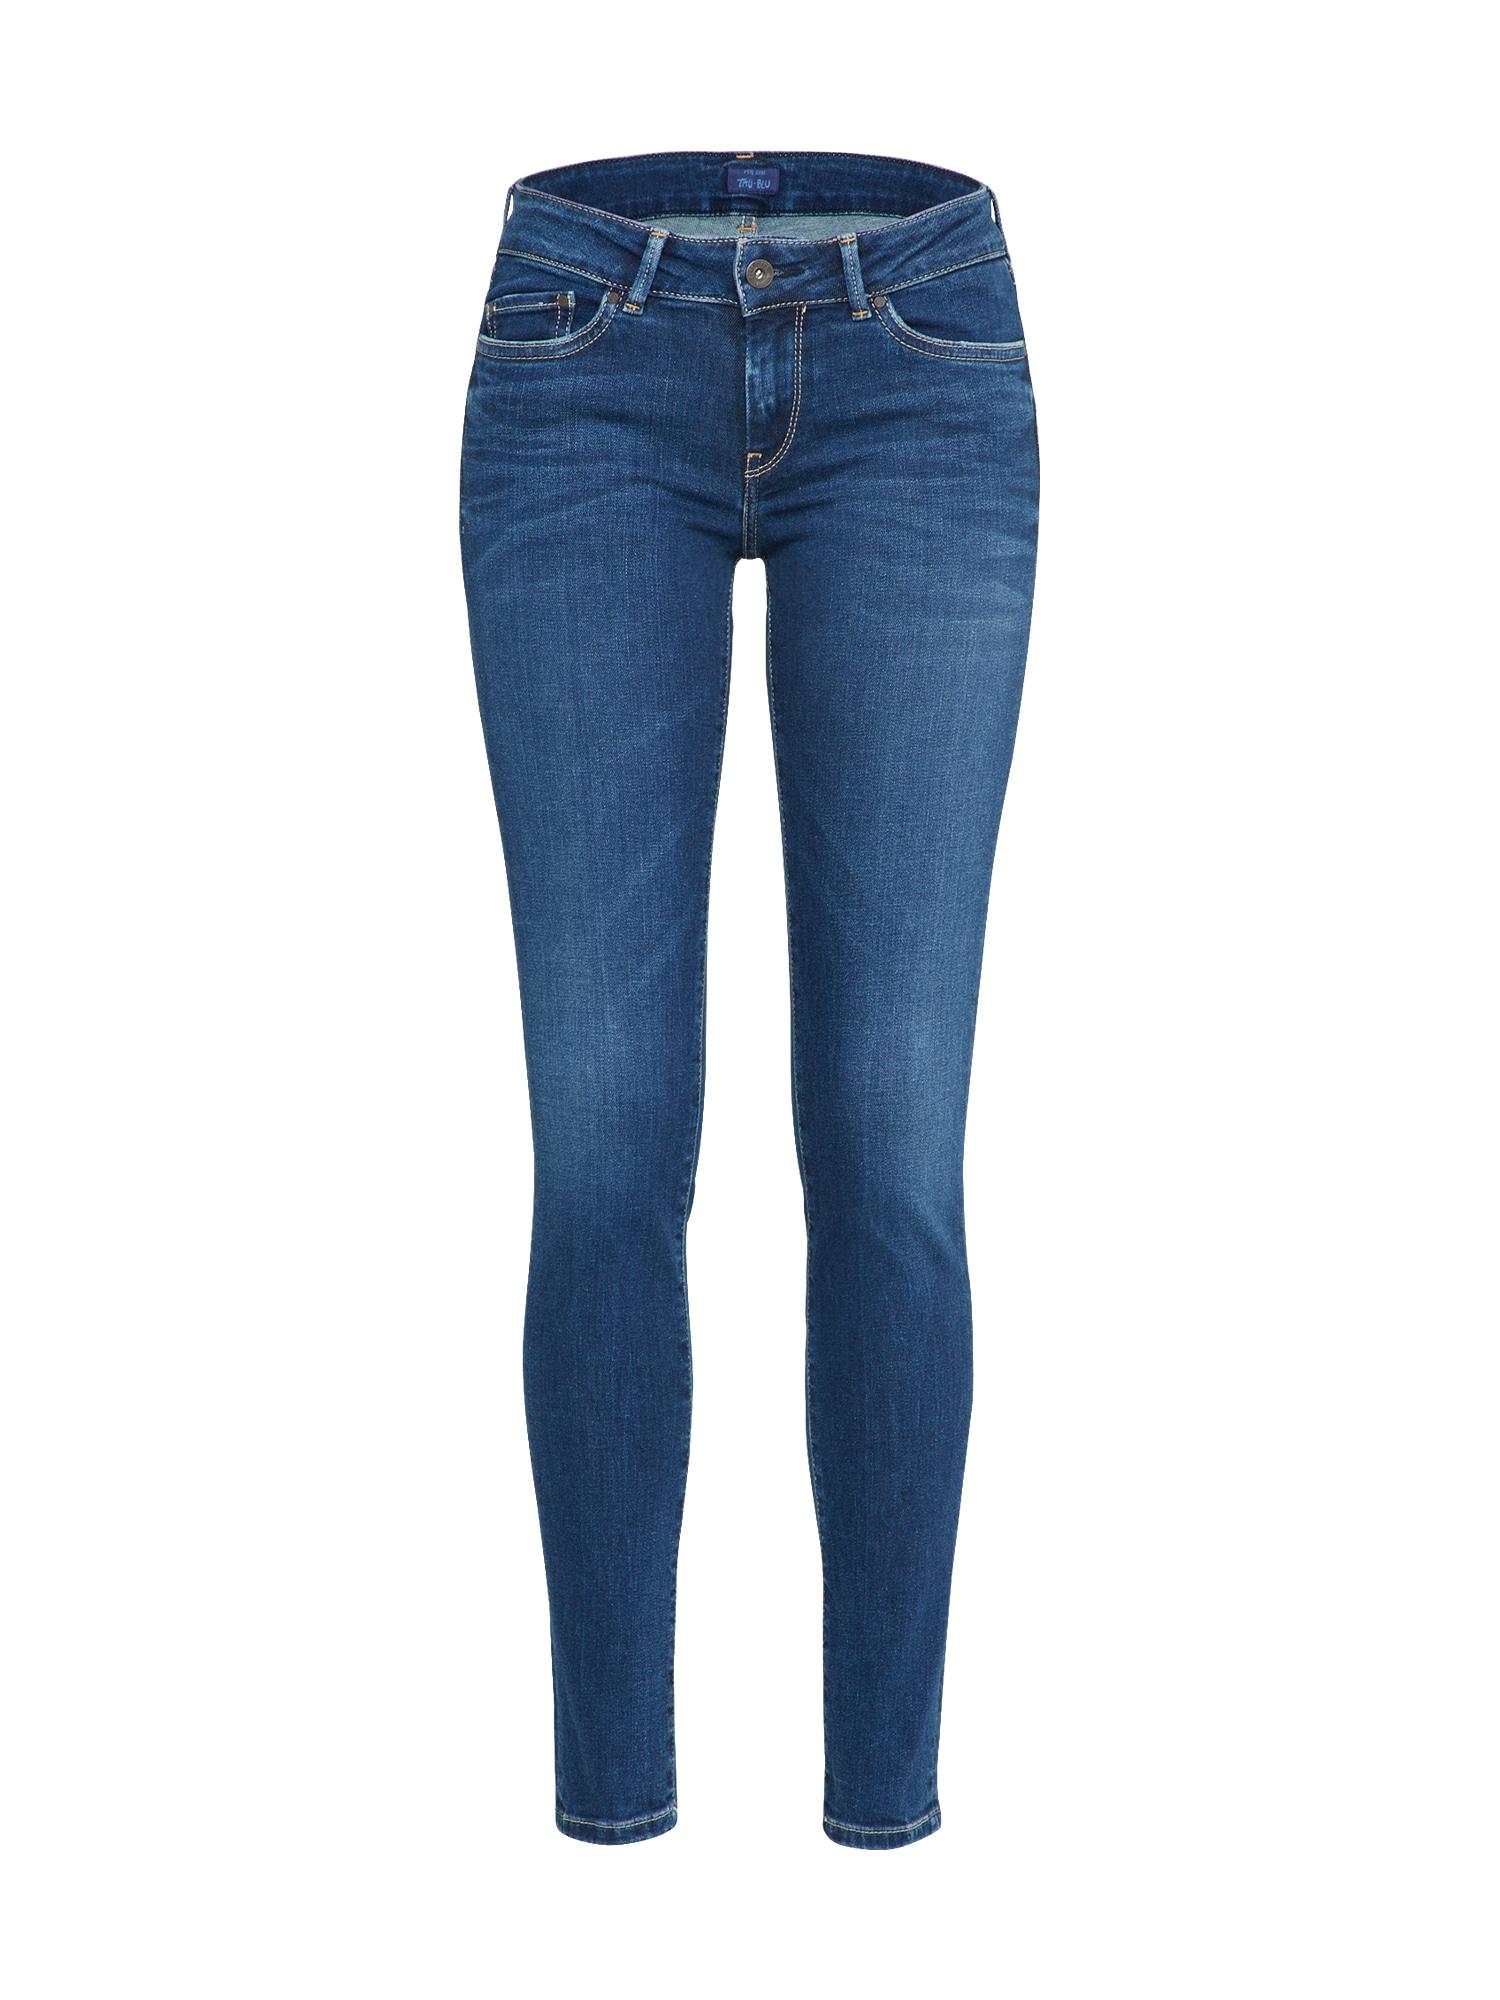 Pepe Jeans Dames Jeans Pixie Garrigou blue denim